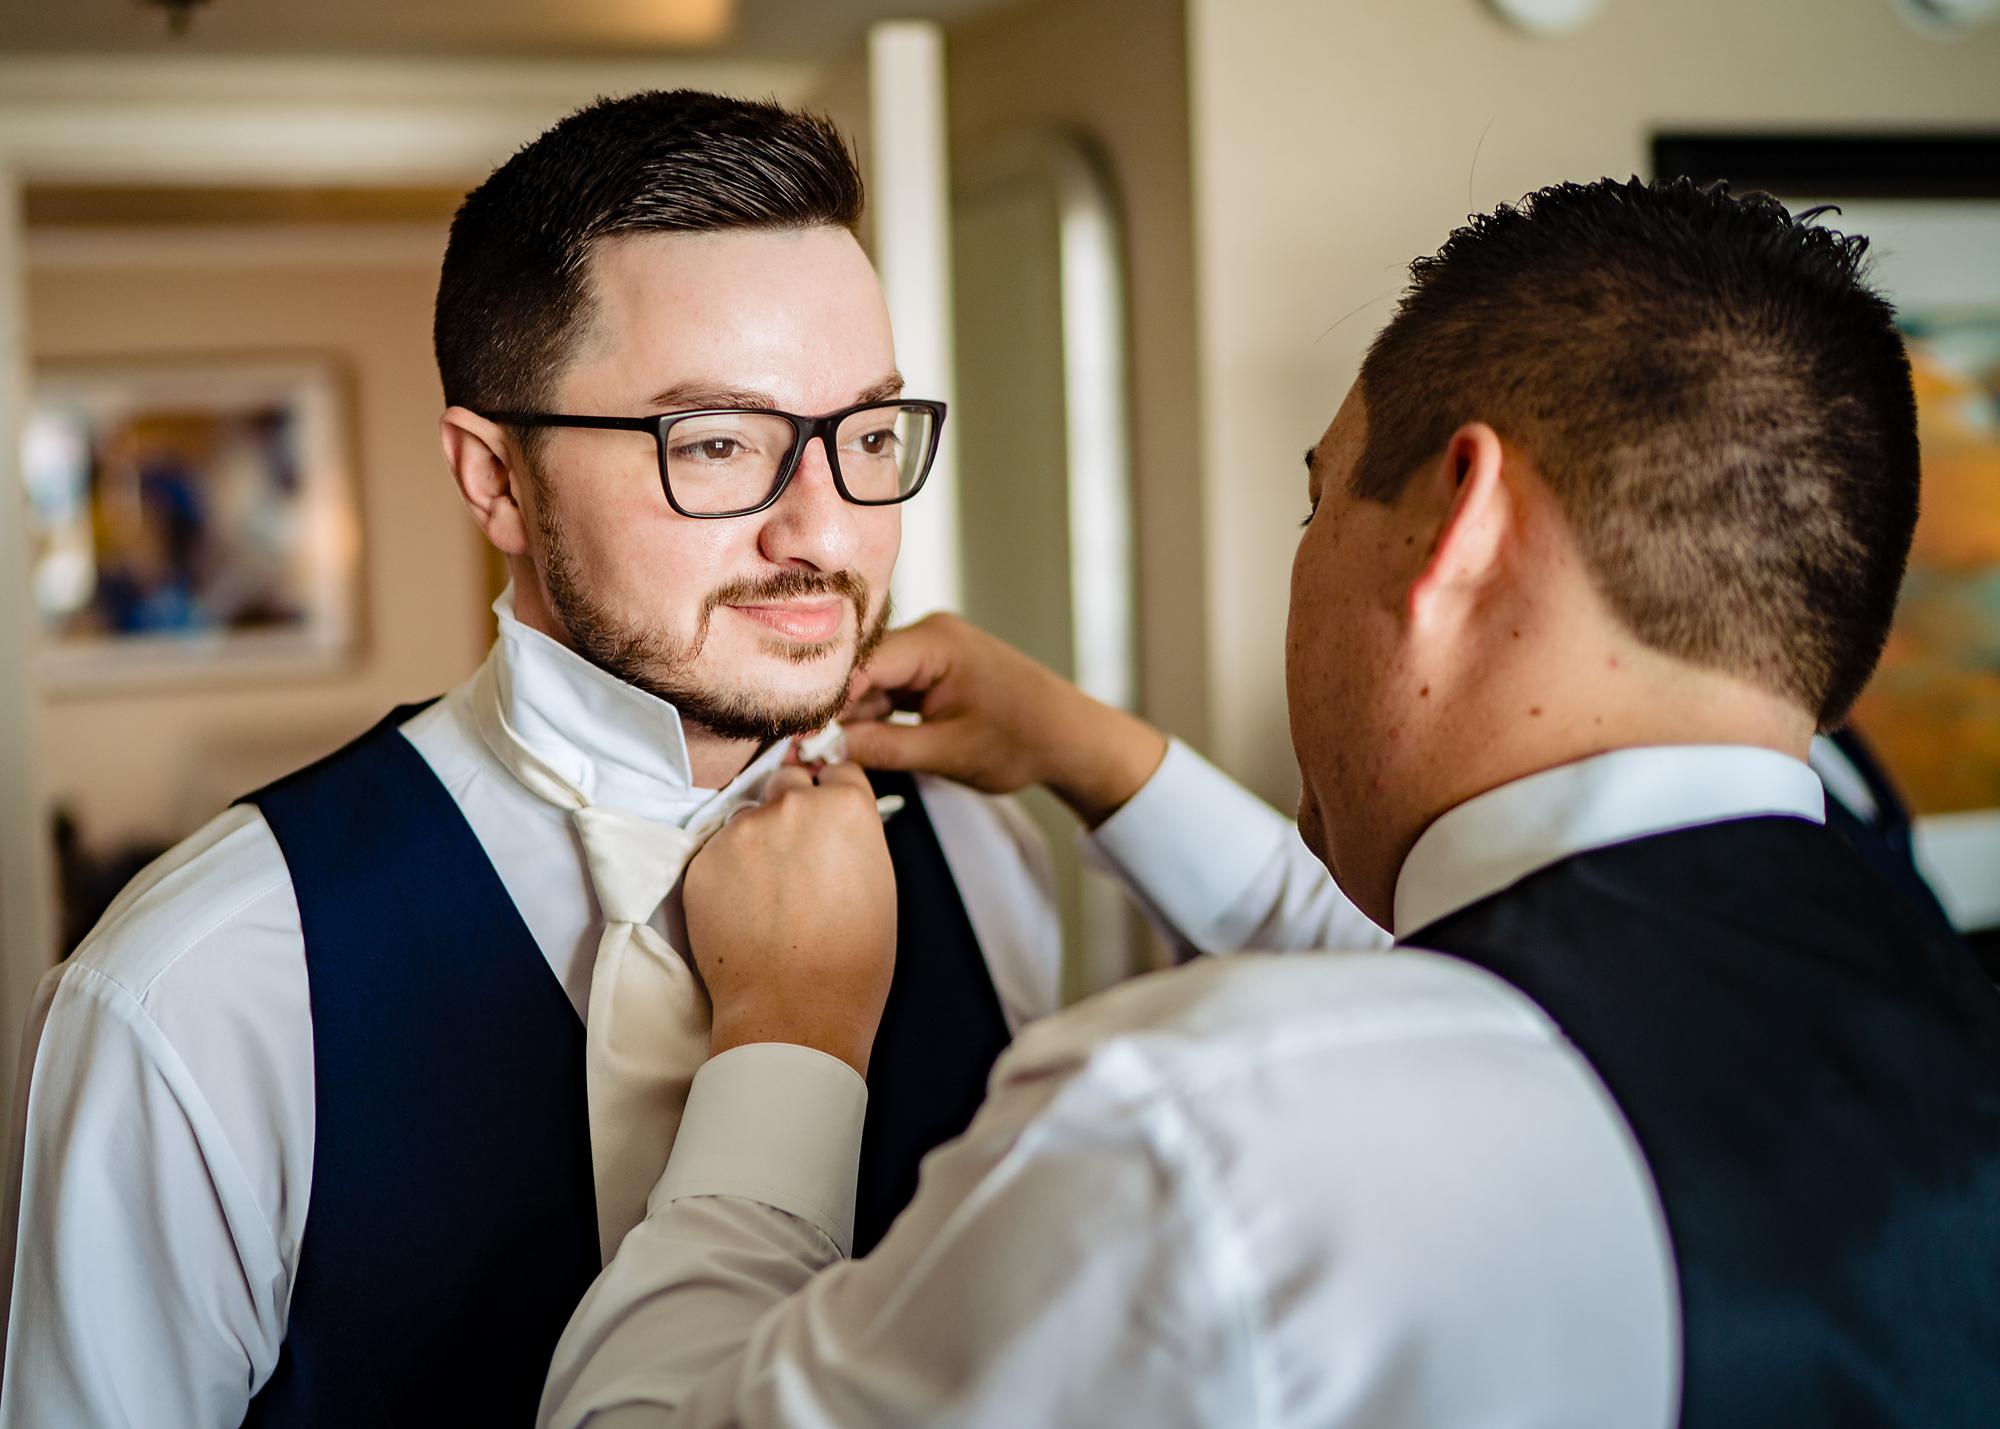 Embassy-Suites-Rivercenter-Wedding-Photography-3.jpg